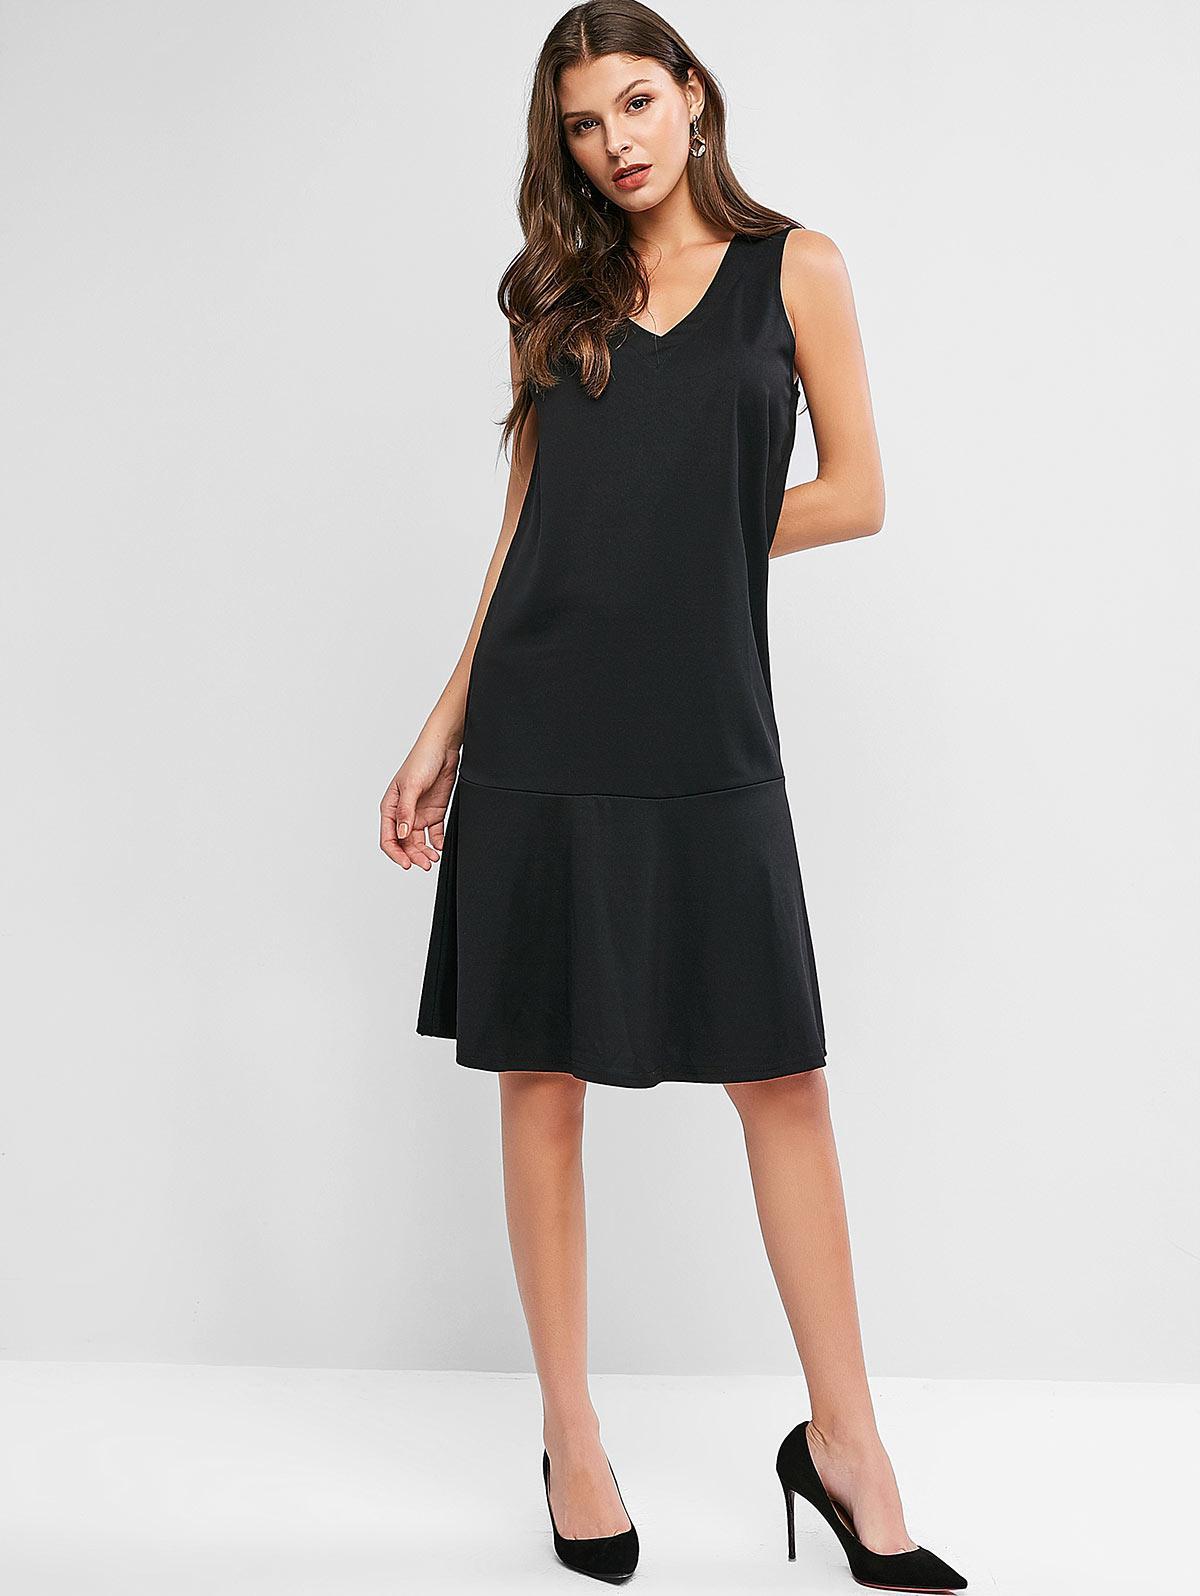 V Neck Flounced Hem Pinafore Casual Dress